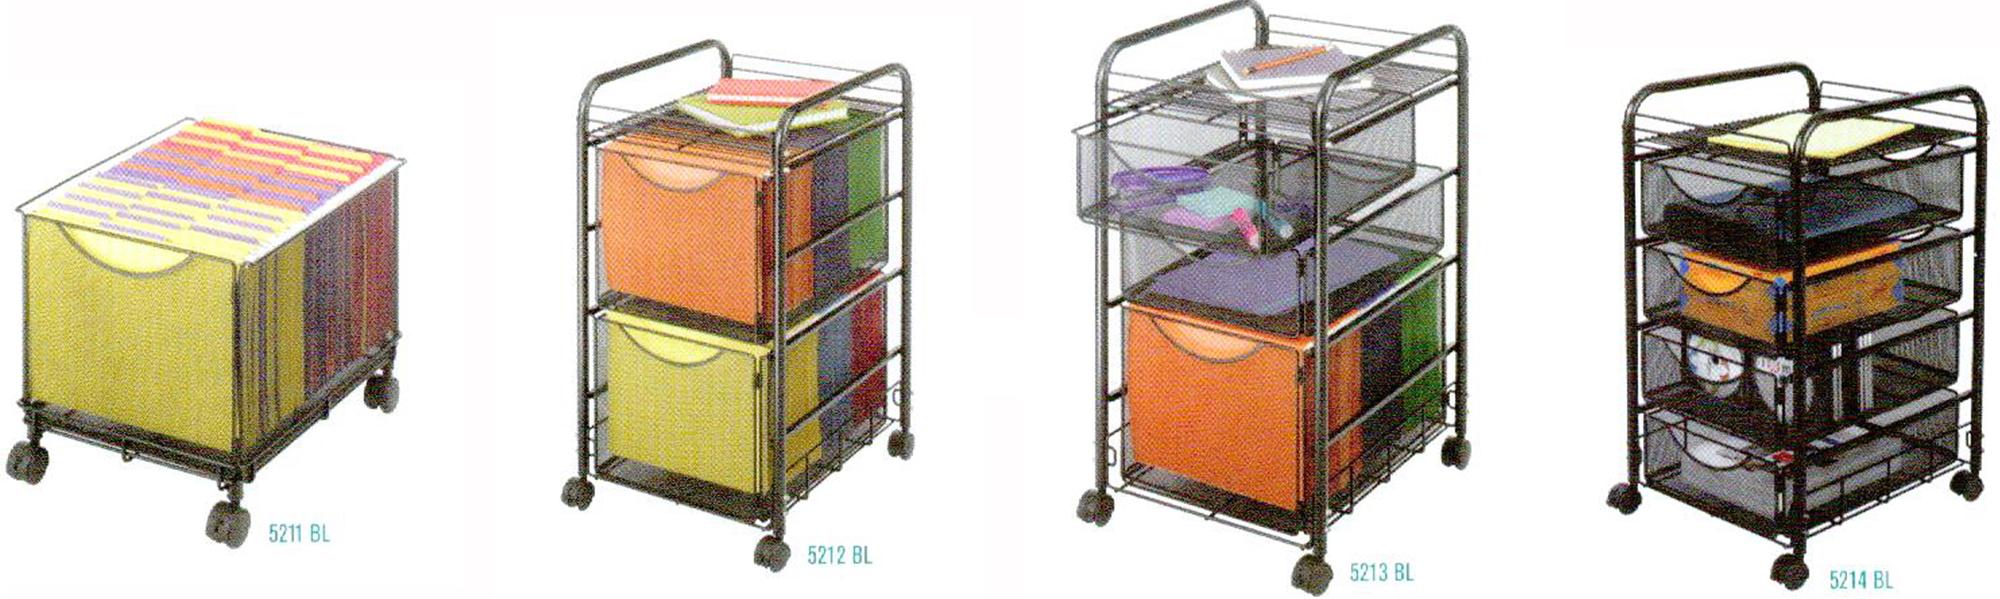 Onyx Mesh File Carts